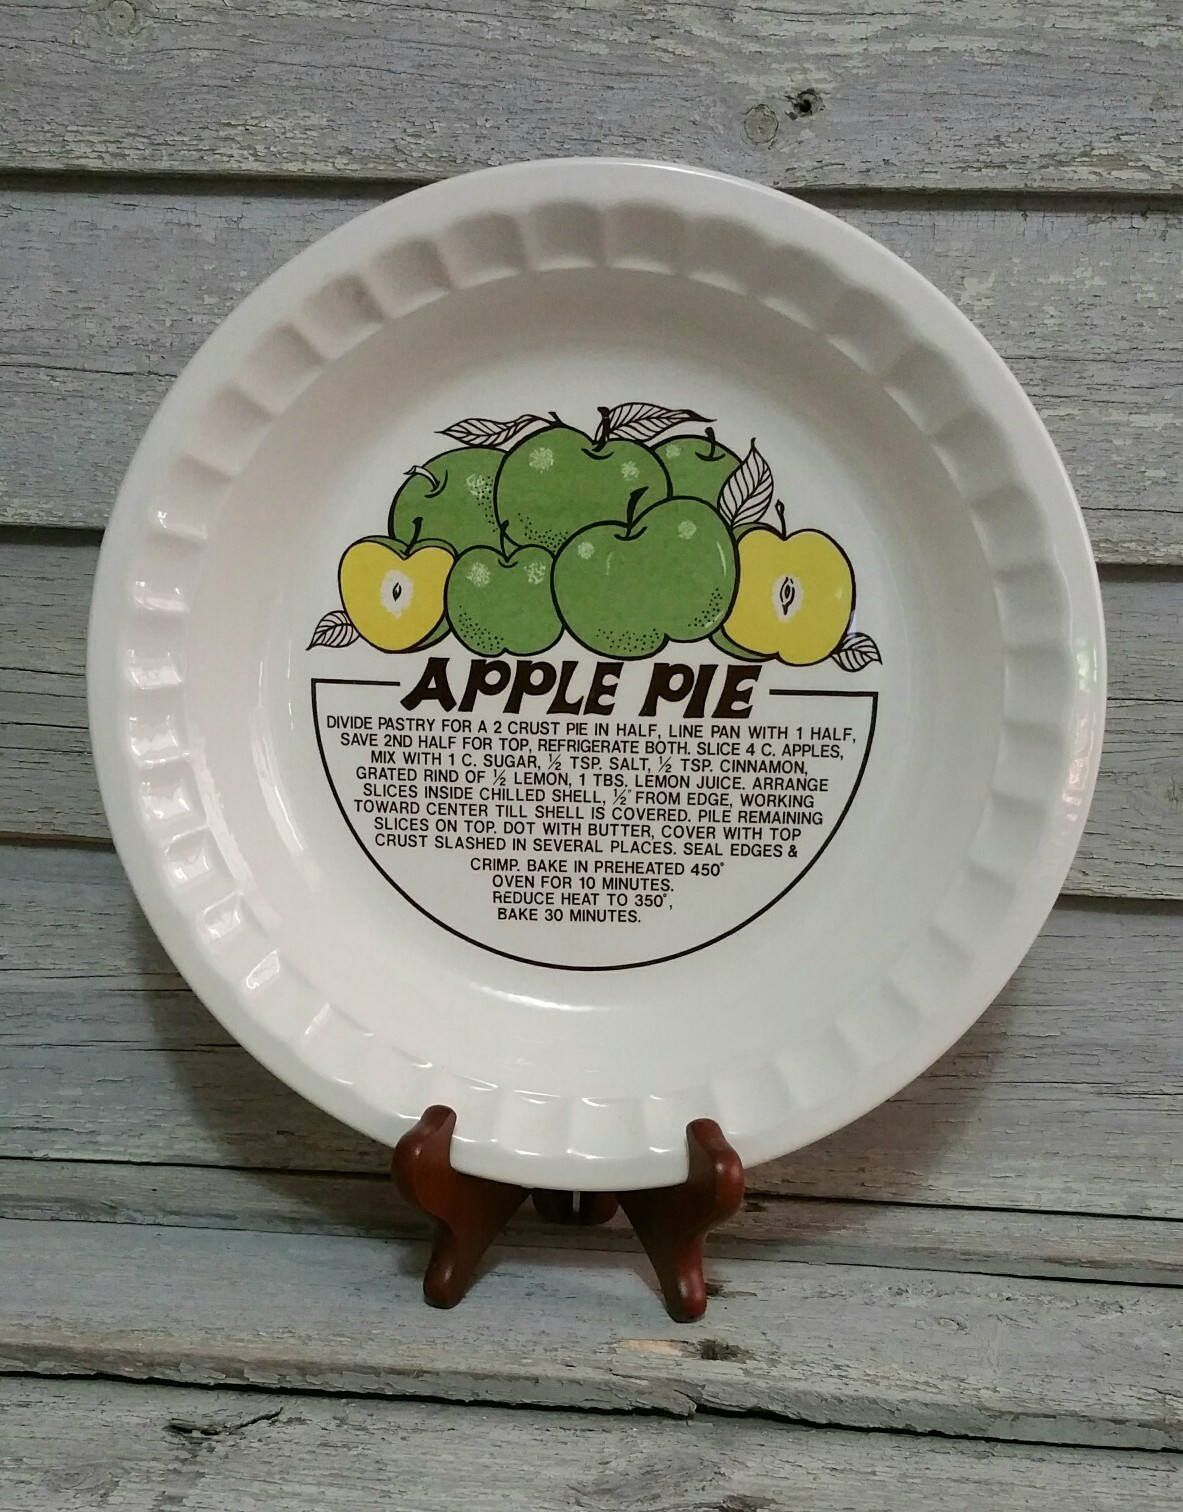 Vintage Ceramic Apple Pie Plate With Recipe Deep Dish Pie Plate Vintage Bakeware by EmptyNestVintage on Etsy & Vintage Ceramic Apple Pie Plate With Recipe Deep Dish Pie Plate ...